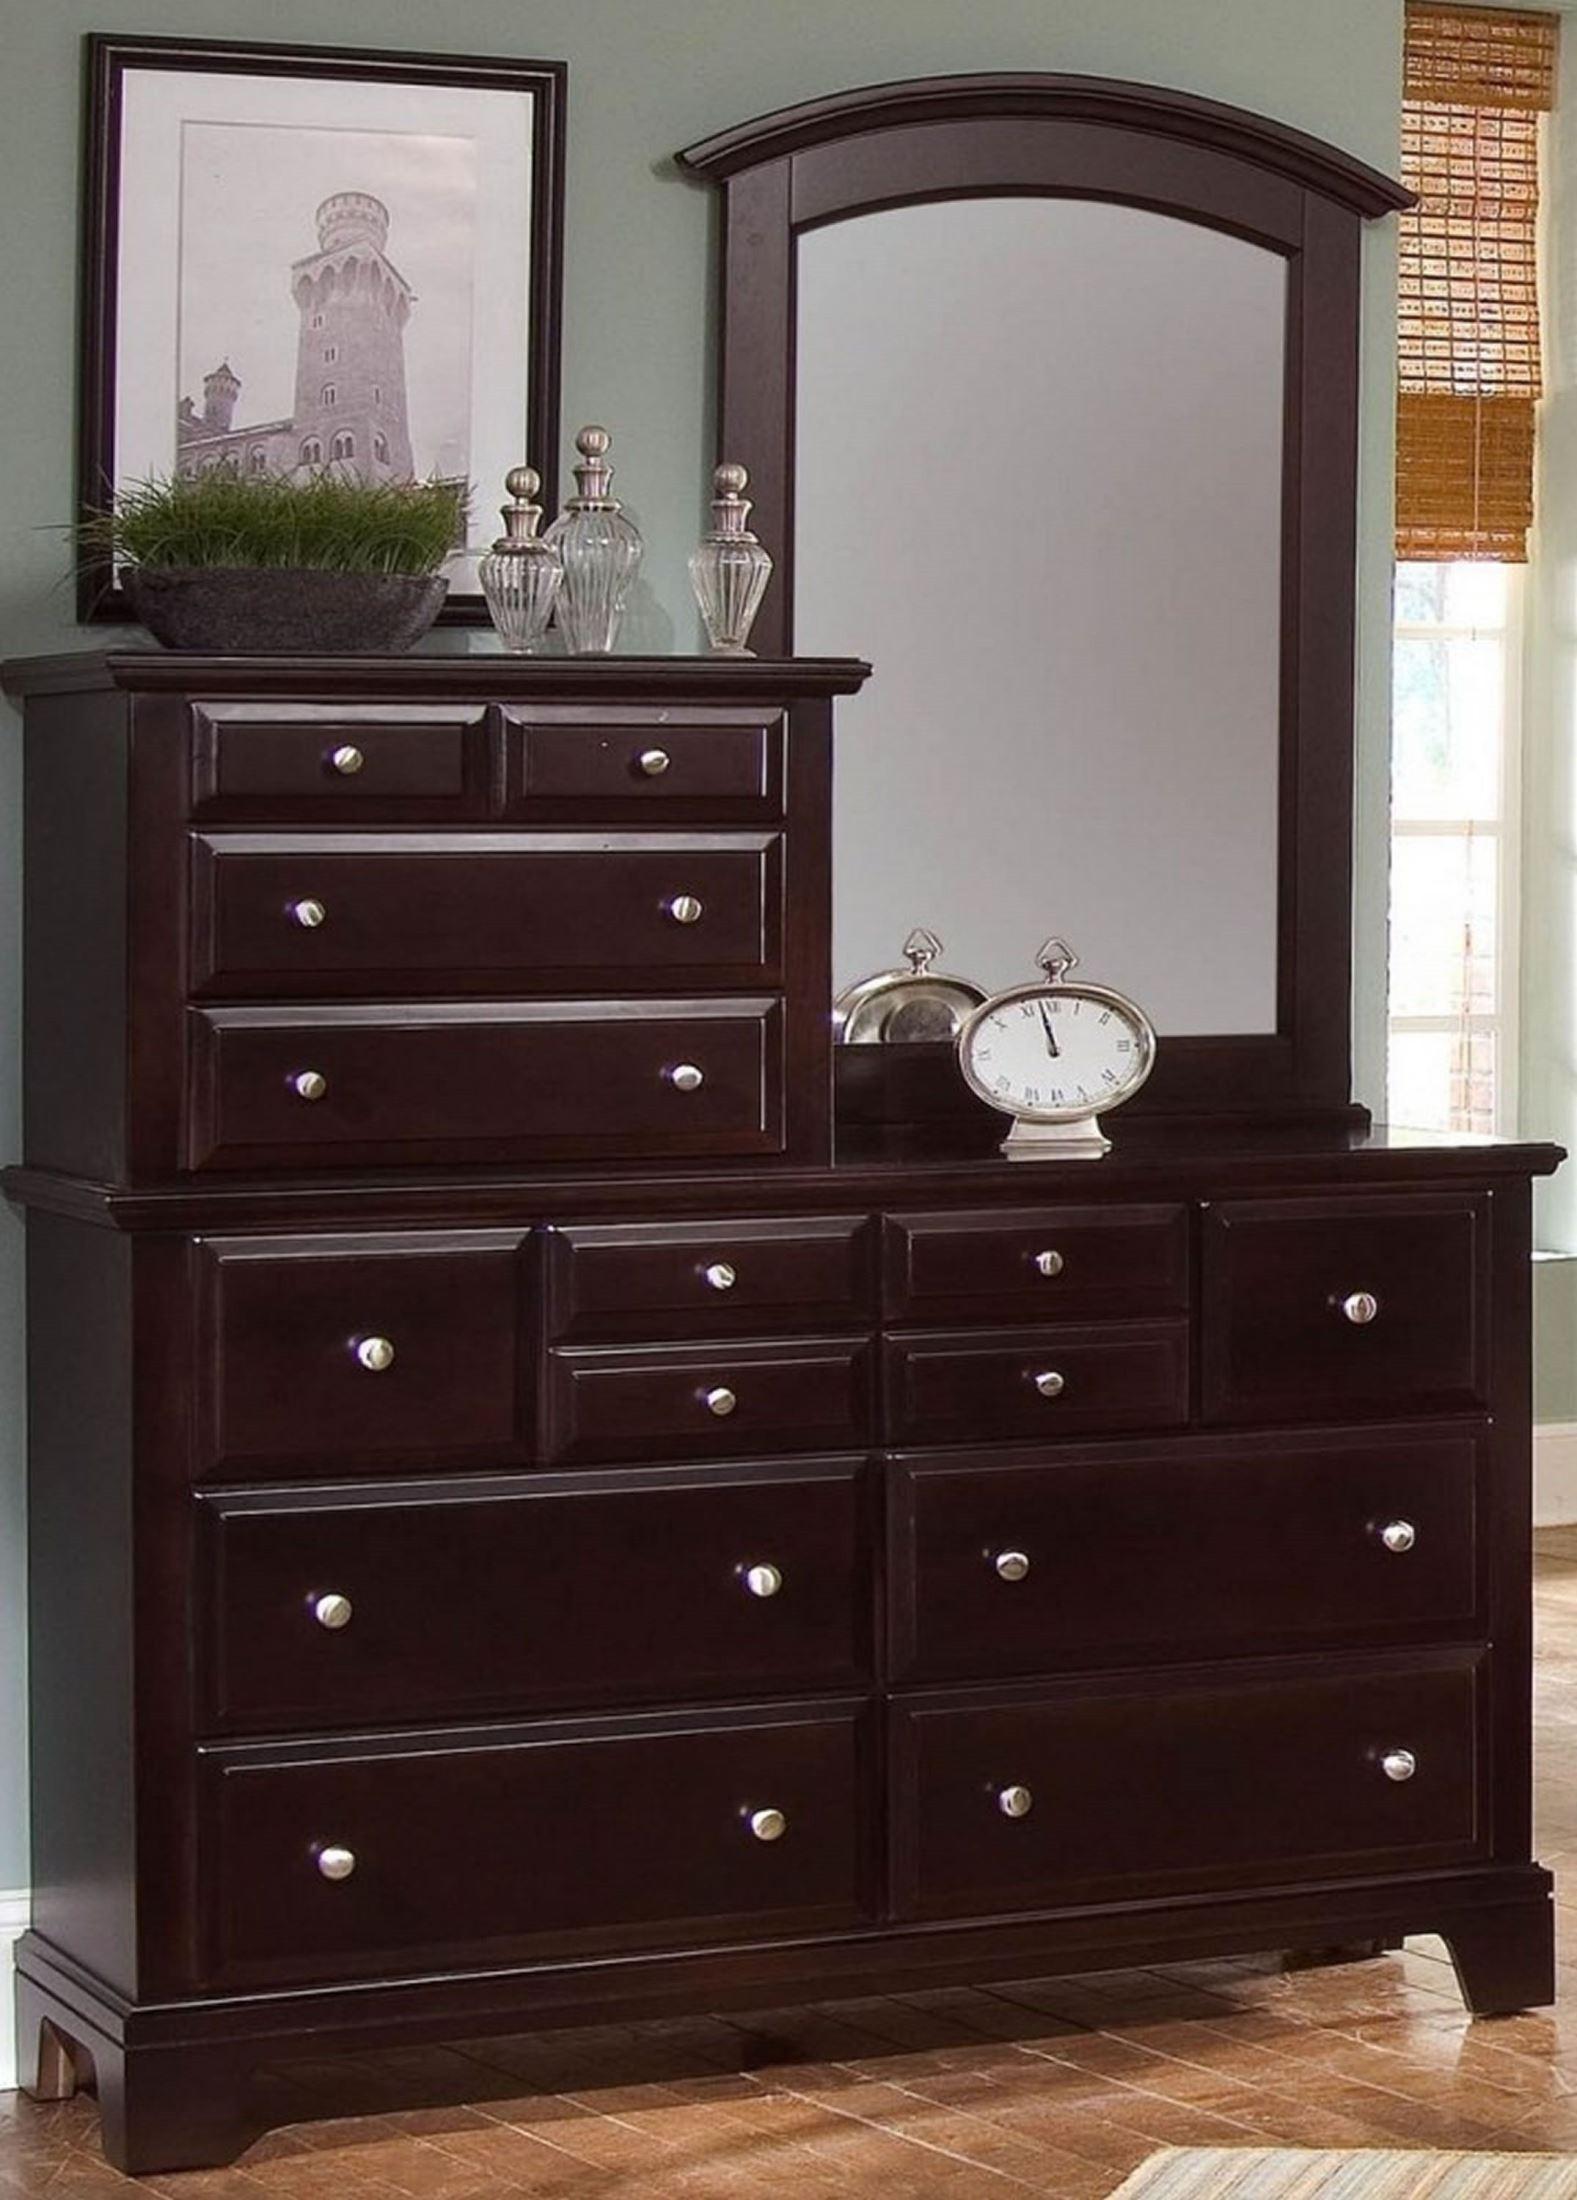 Hamilton Franklin Merlot 10 Drawer Vanity Dresser From Virginia House Coleman Furniture